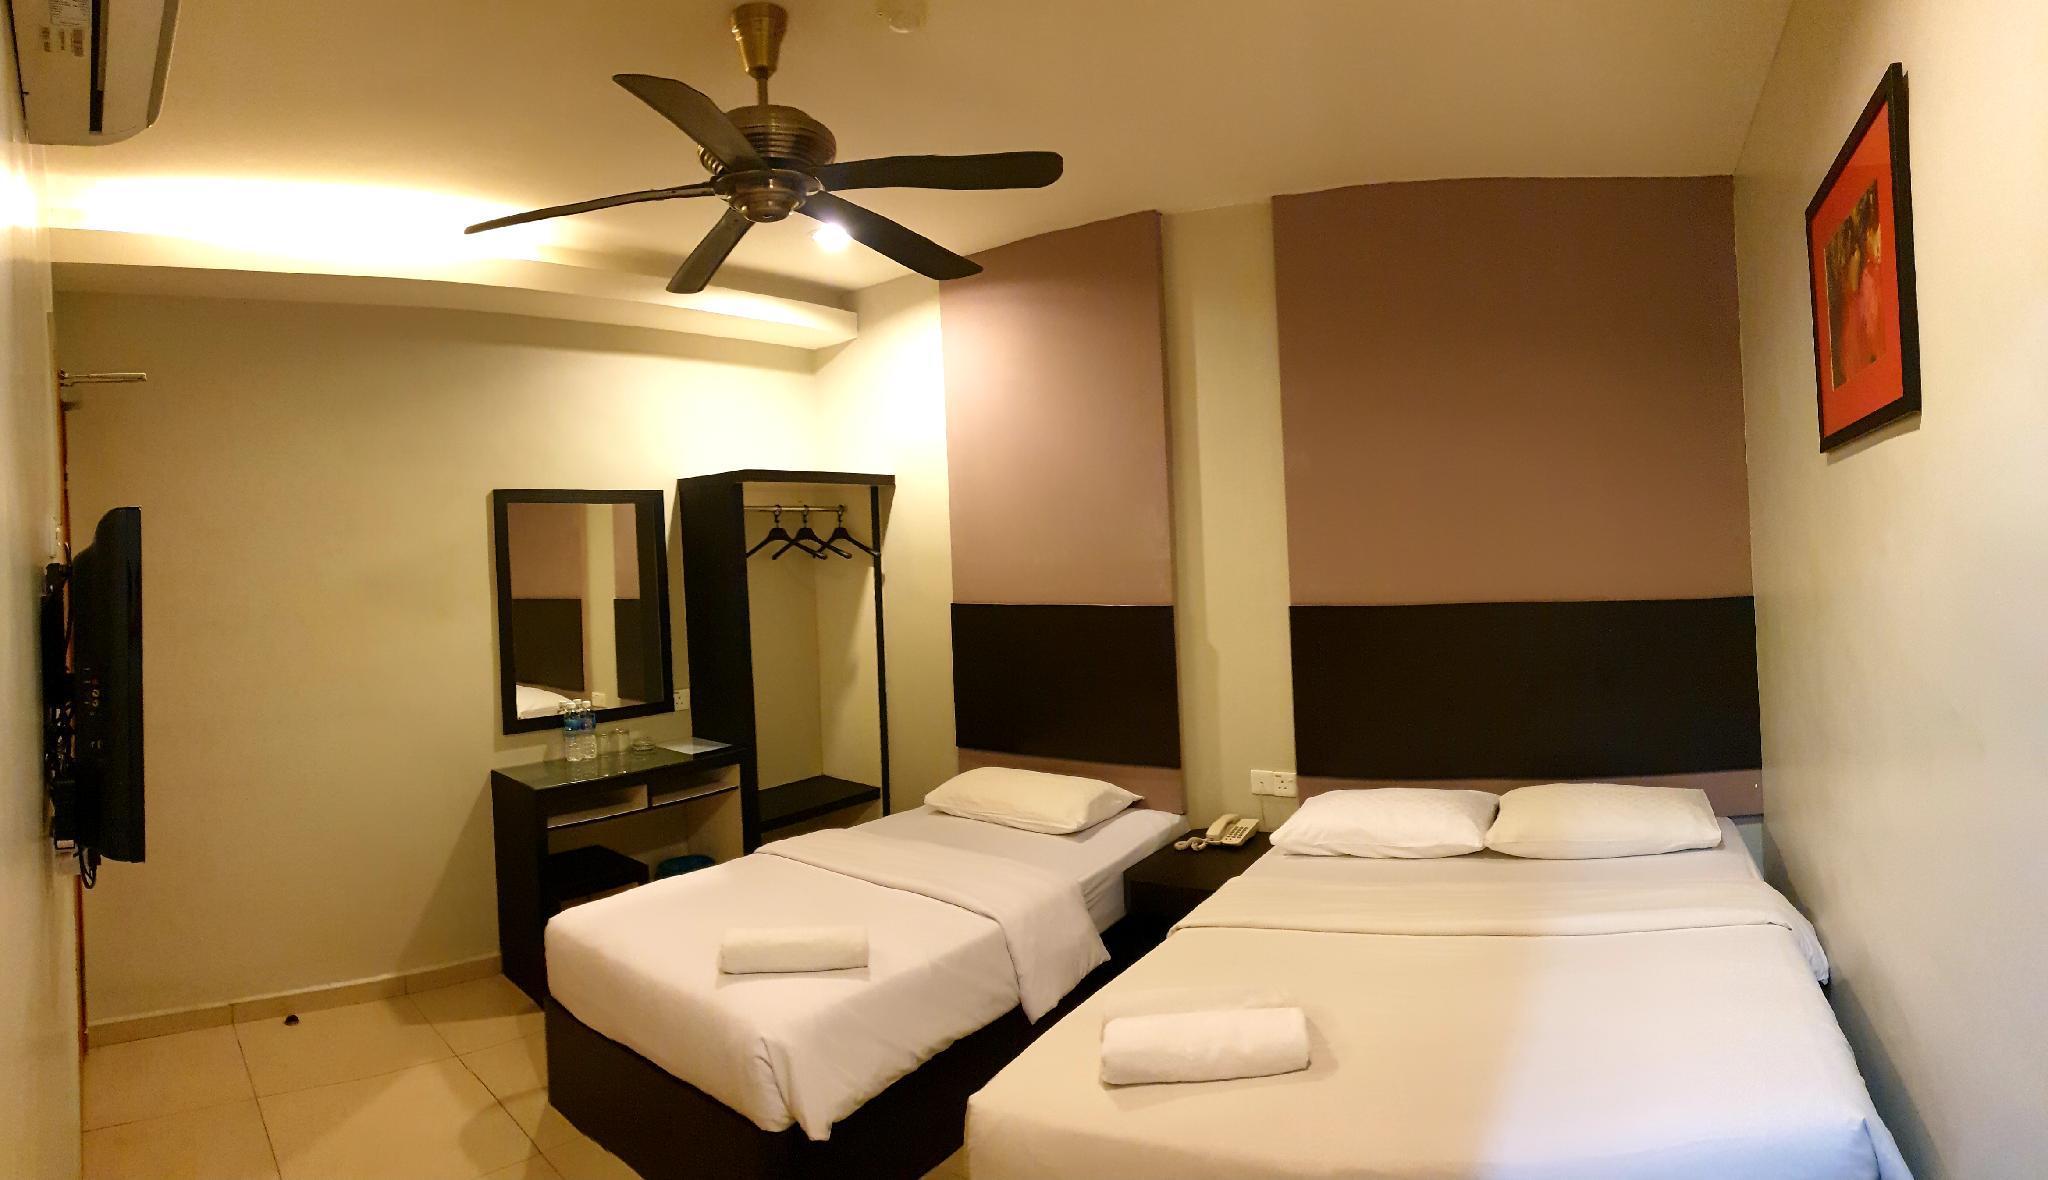 Golden Court Hotel @ Jalan Tun Abdul Razak, Johor Bahru